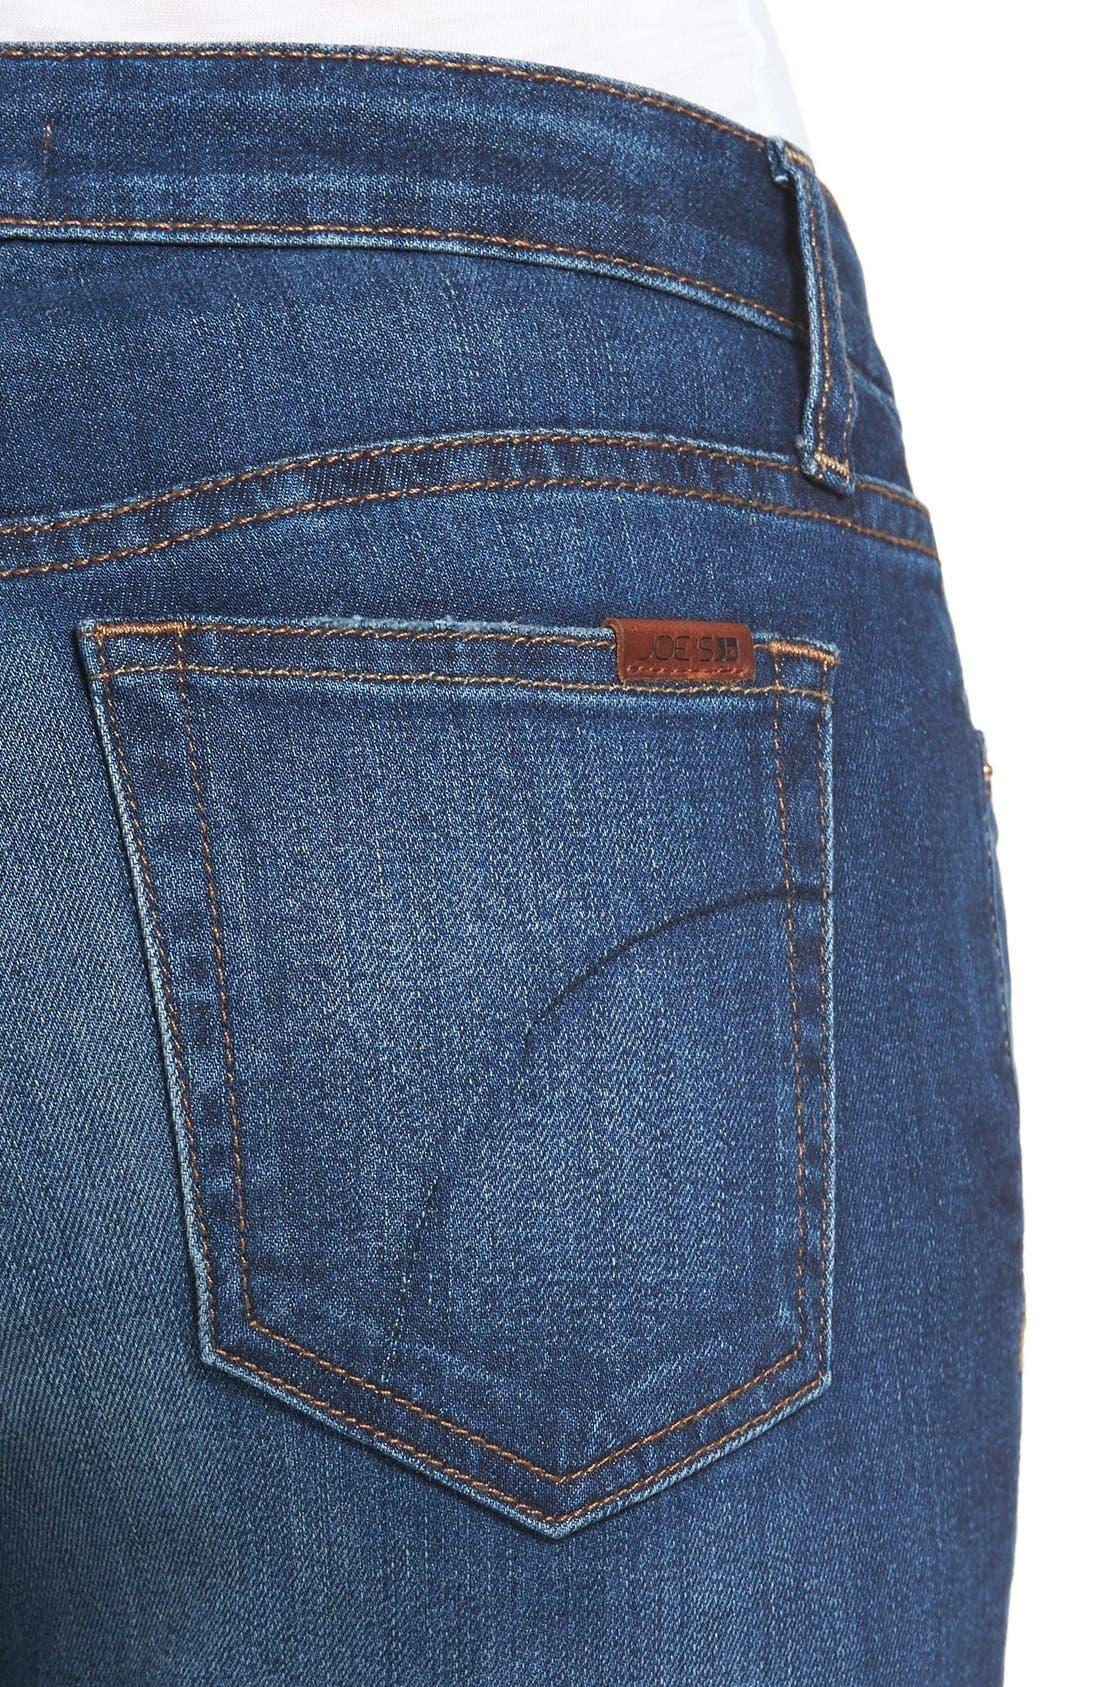 'Flawless - Honey' Curvy Bootcut Jeans,                             Alternate thumbnail 4, color,                             Lyla